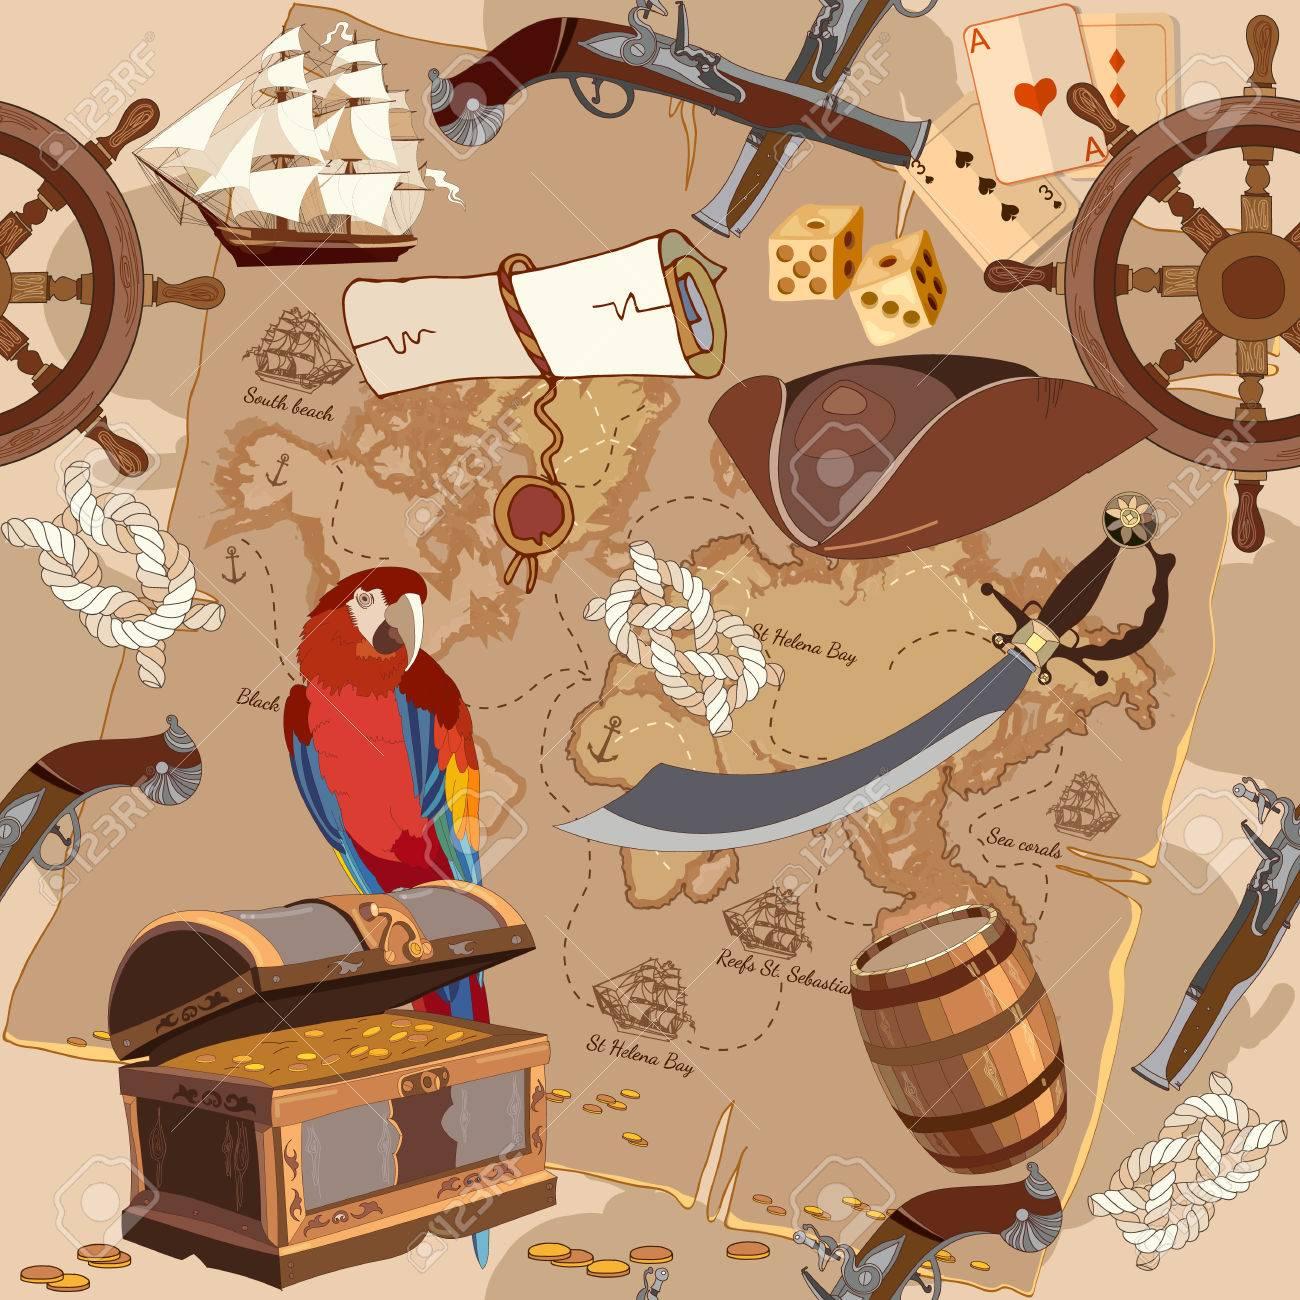 Pirate Woman Opening Treasure Chest Illustration 11853756 - Megapixl